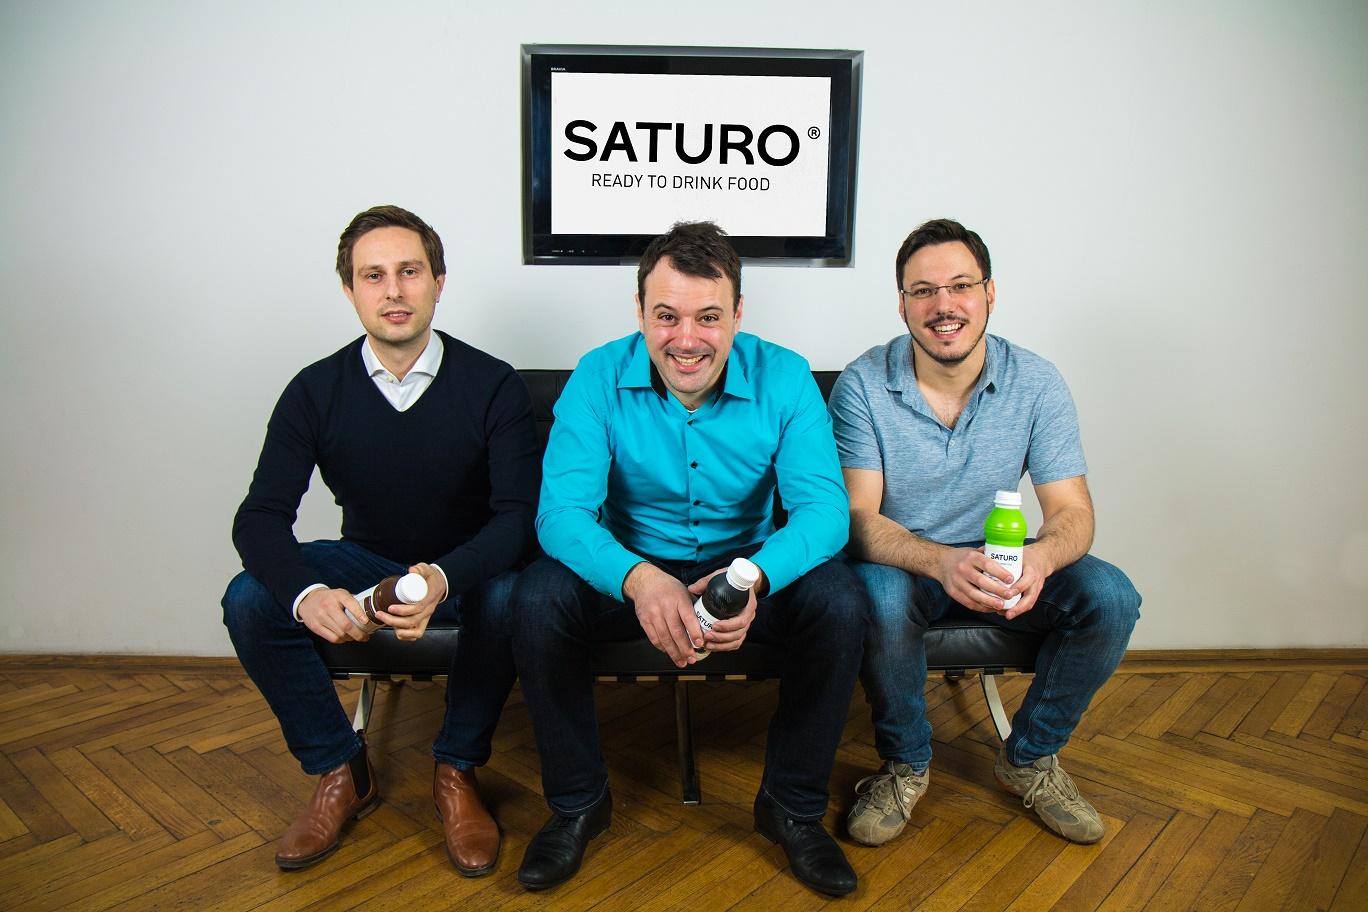 Zakladatelé startupu Saturo v čele s Hannesem Feistenauerem